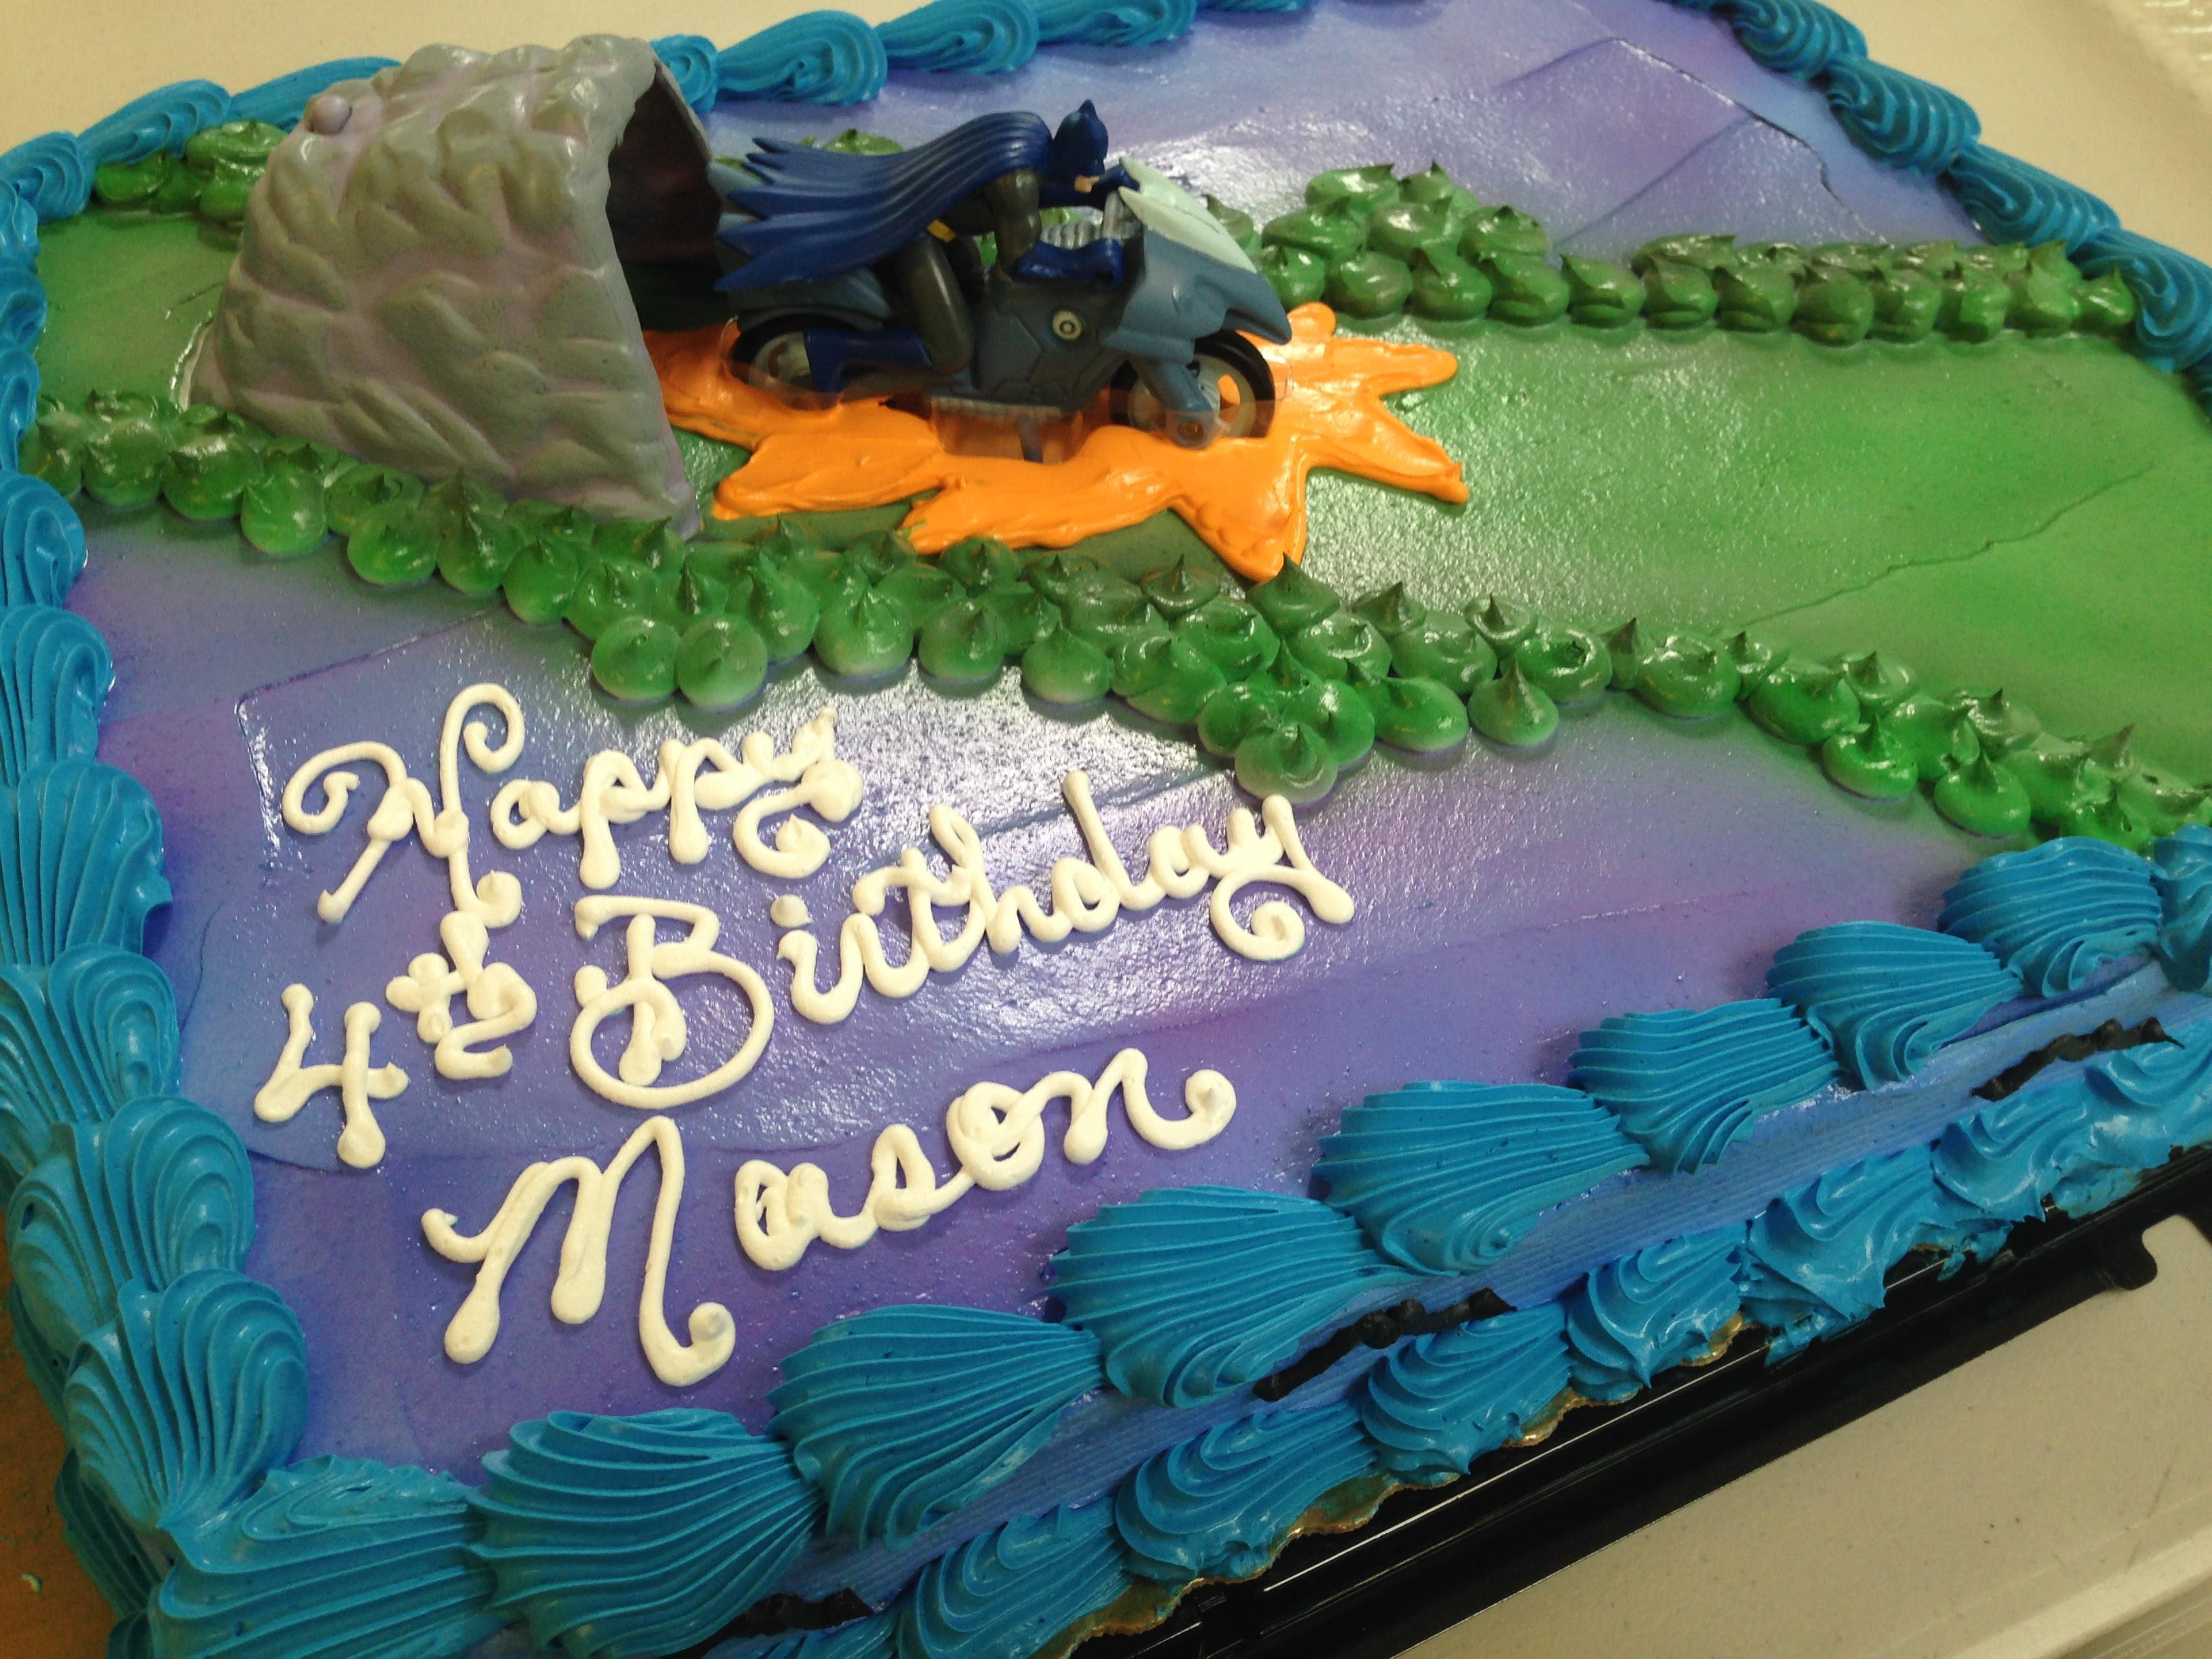 Thomas The Train Birthday Cake Kroger Http Dimitrastories Blogspot Com